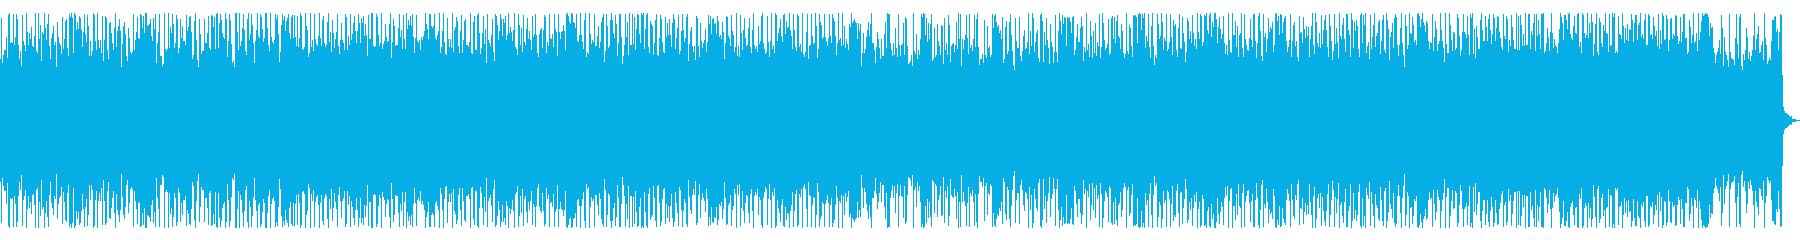 80s シンセポップ・レトロ・スケール感の再生済みの波形